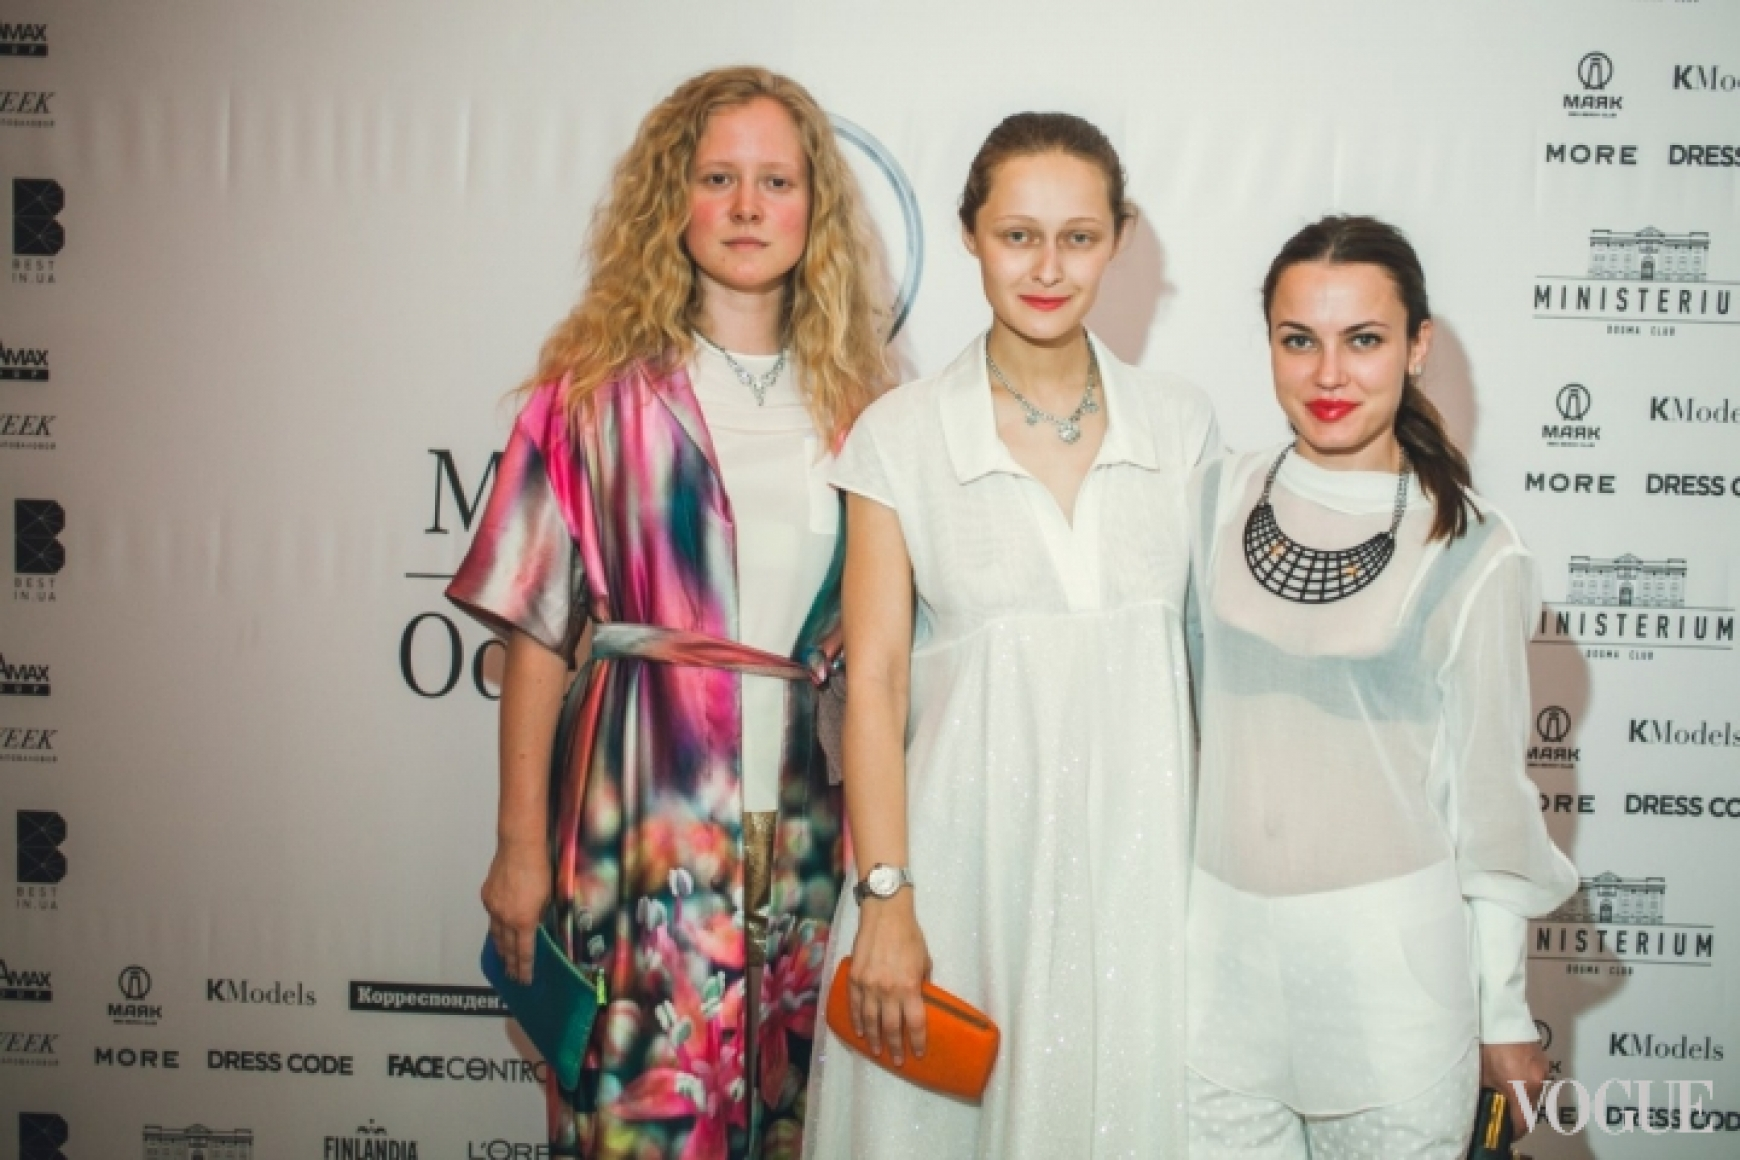 Анна Октябрь, Дарья Шаповалова, Яся Миночкина